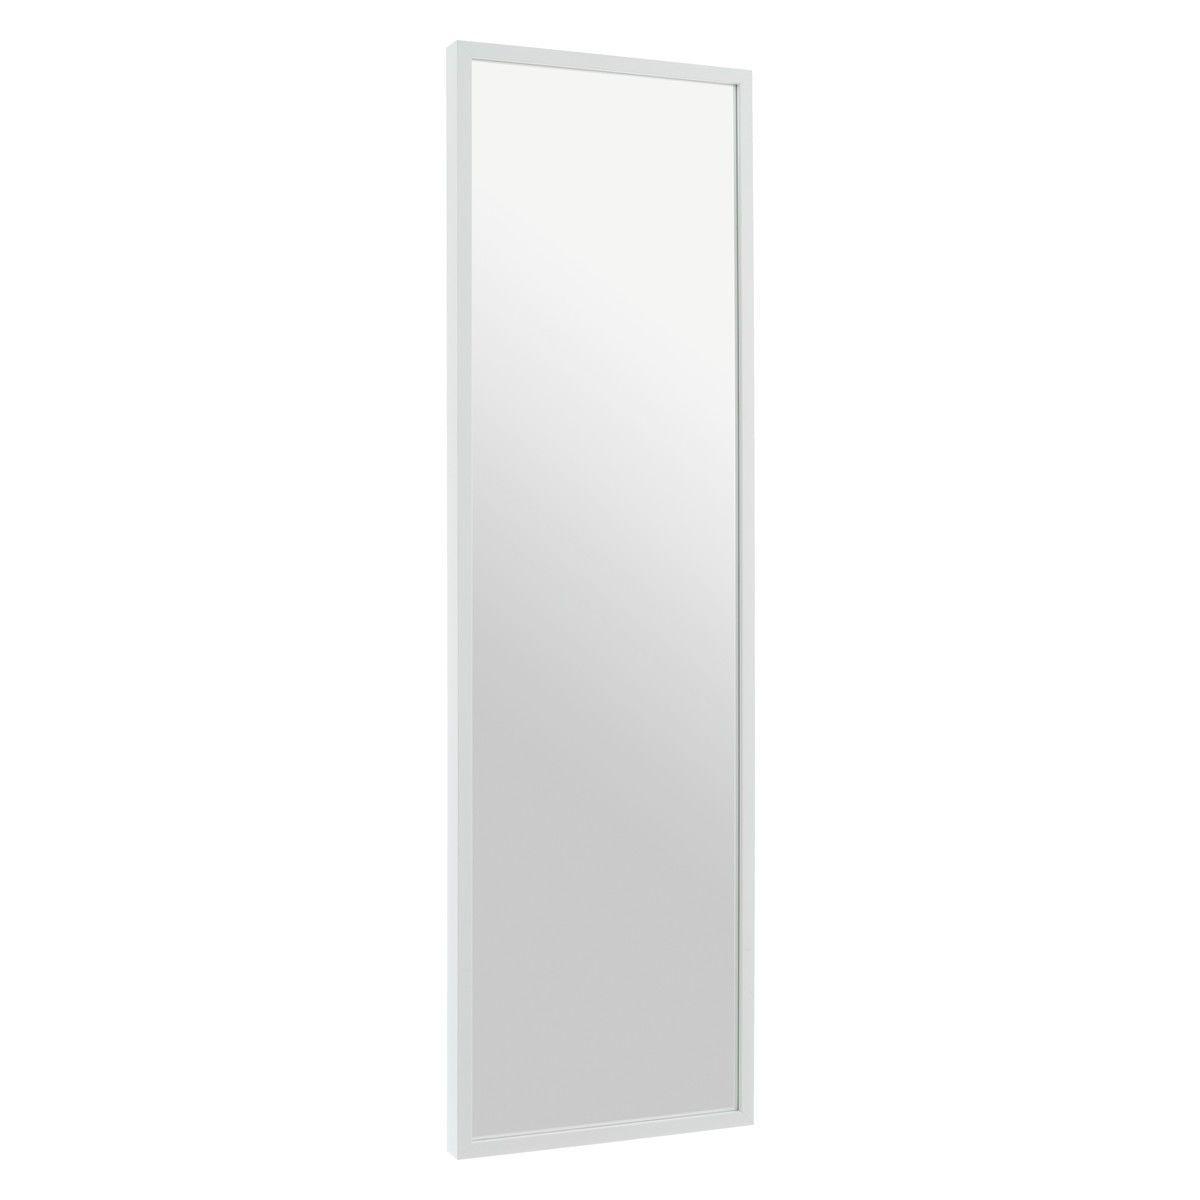 White Birch 40 X 140cm White Full Length Wall Mirror Birch High